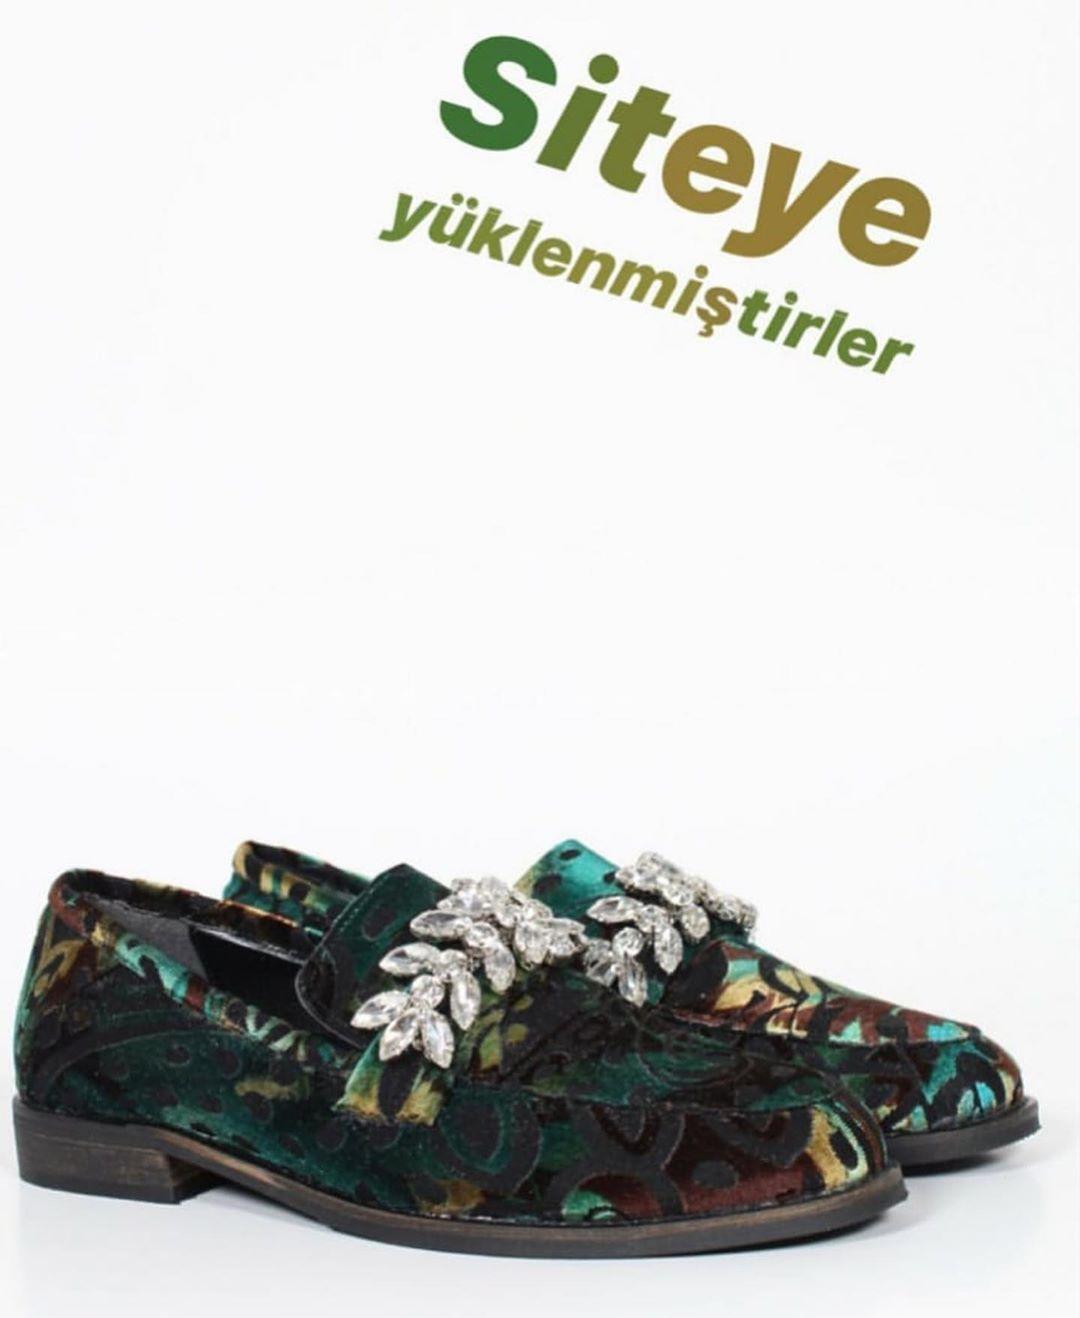 احذية نسائية أحذيةبالجملة شتوي بوط Toptanayakkabi Bayanayakkabi Botayakkabi Gucci Luisviton Gedikpasa Women Shoes Shoe Recipe Womens Fashion Sneakers